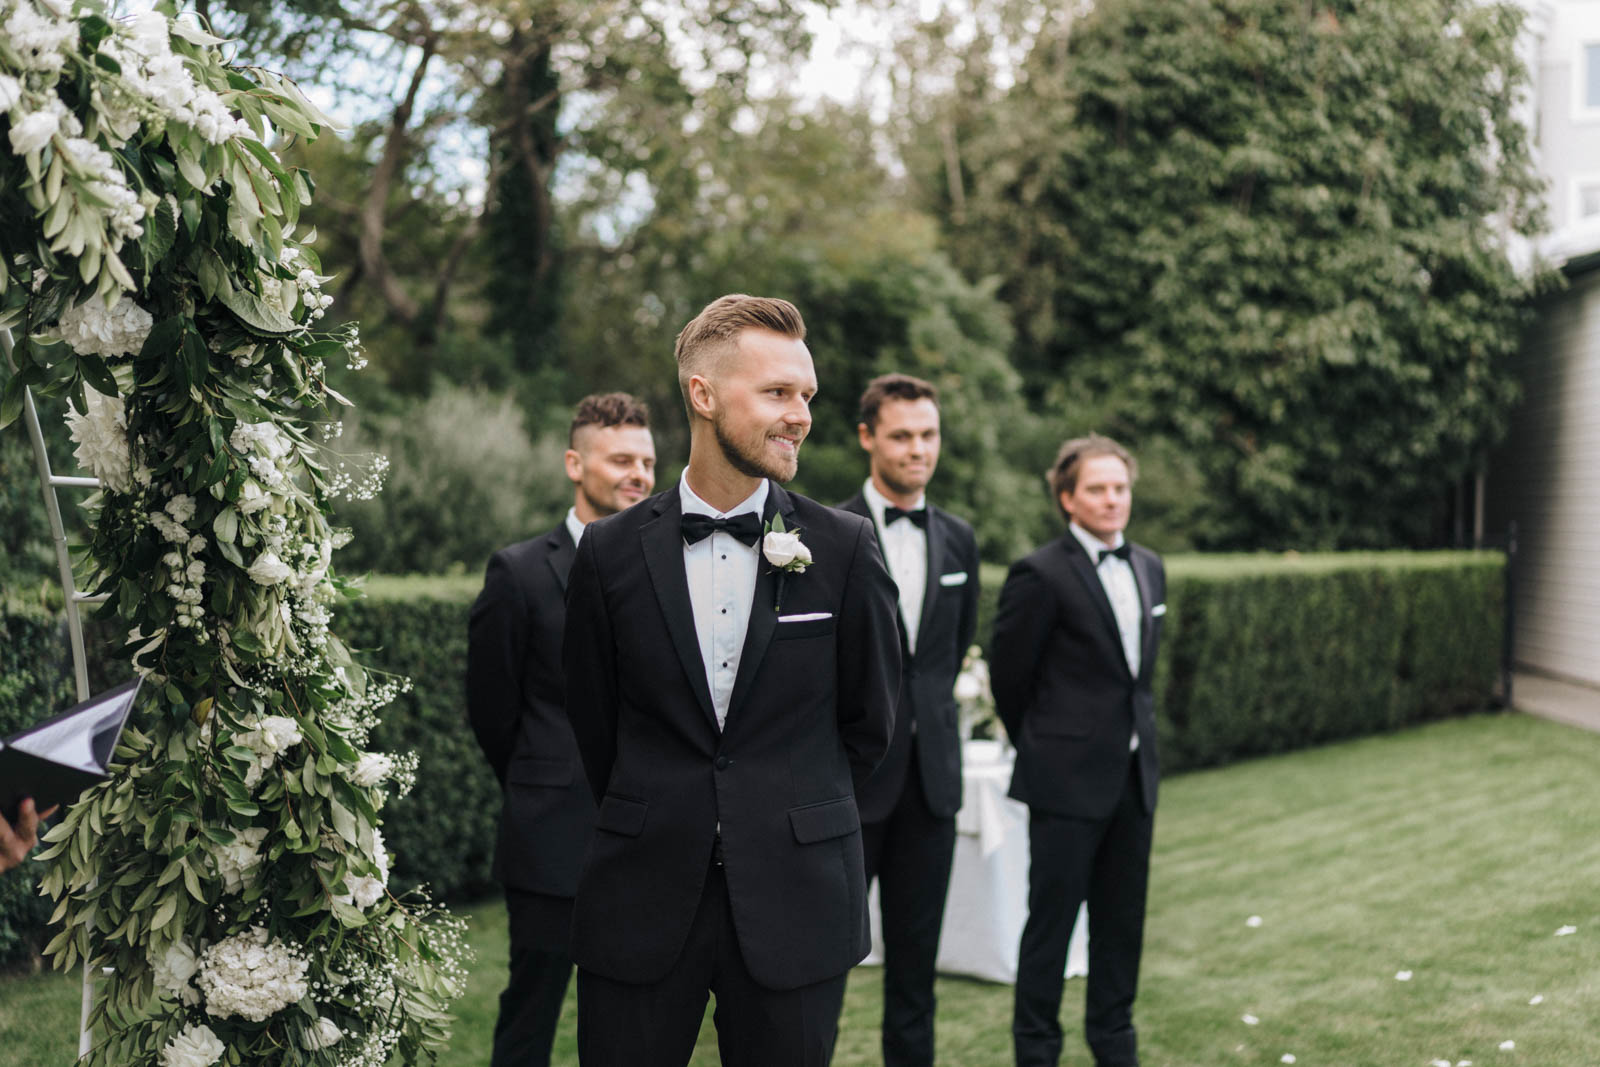 newfound-k-s-hilton-taupo-wedding-photographer-028